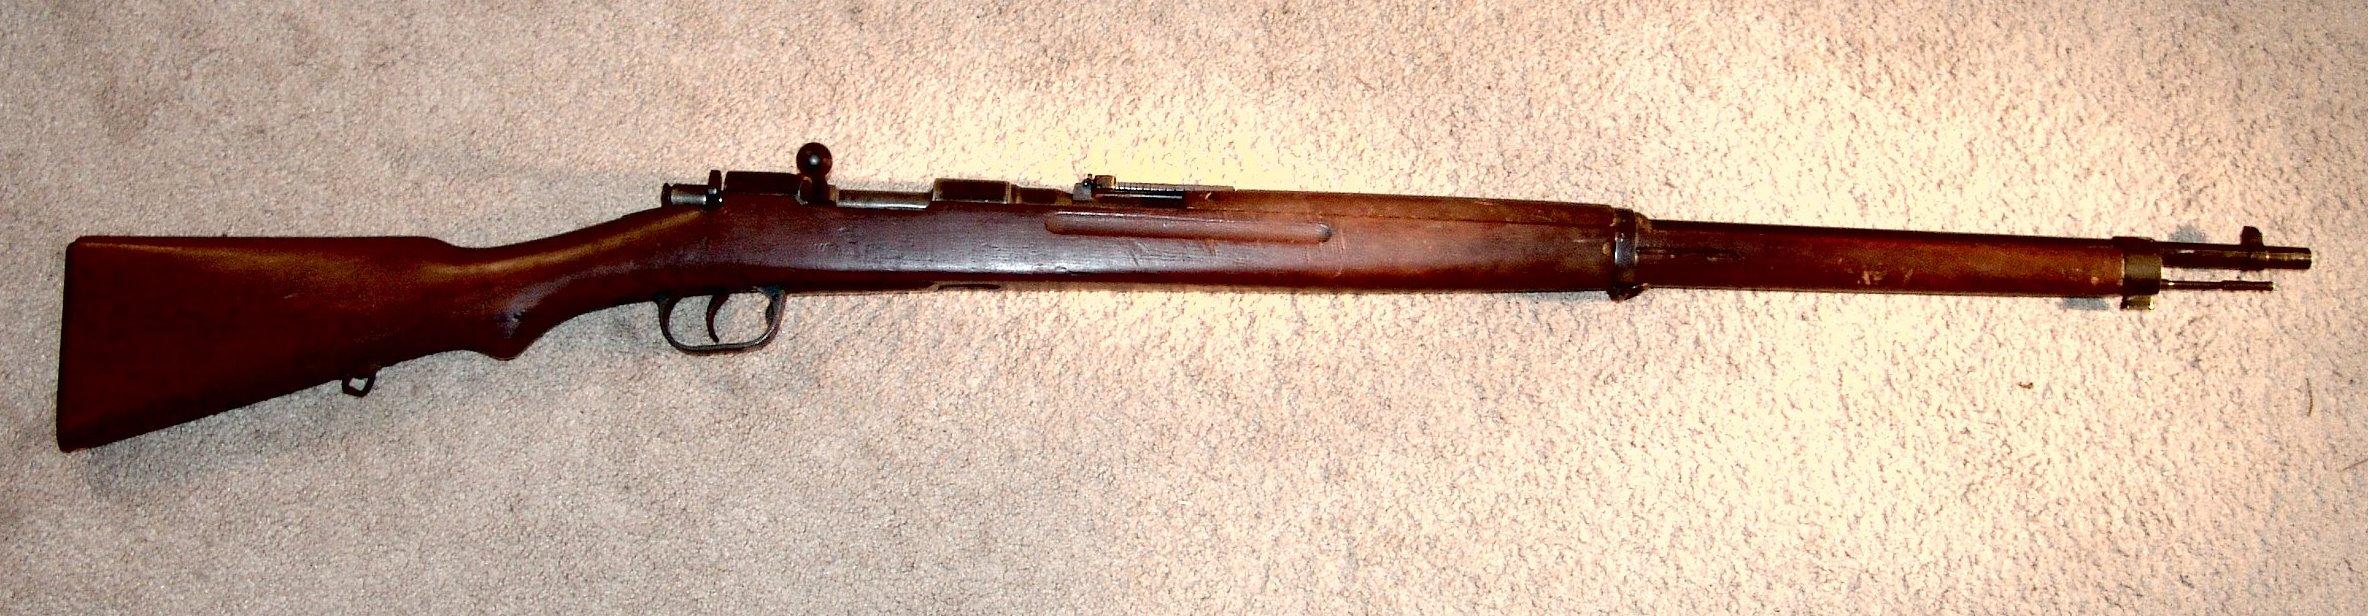 Fusil Tipo 1 Type_I_Rifle